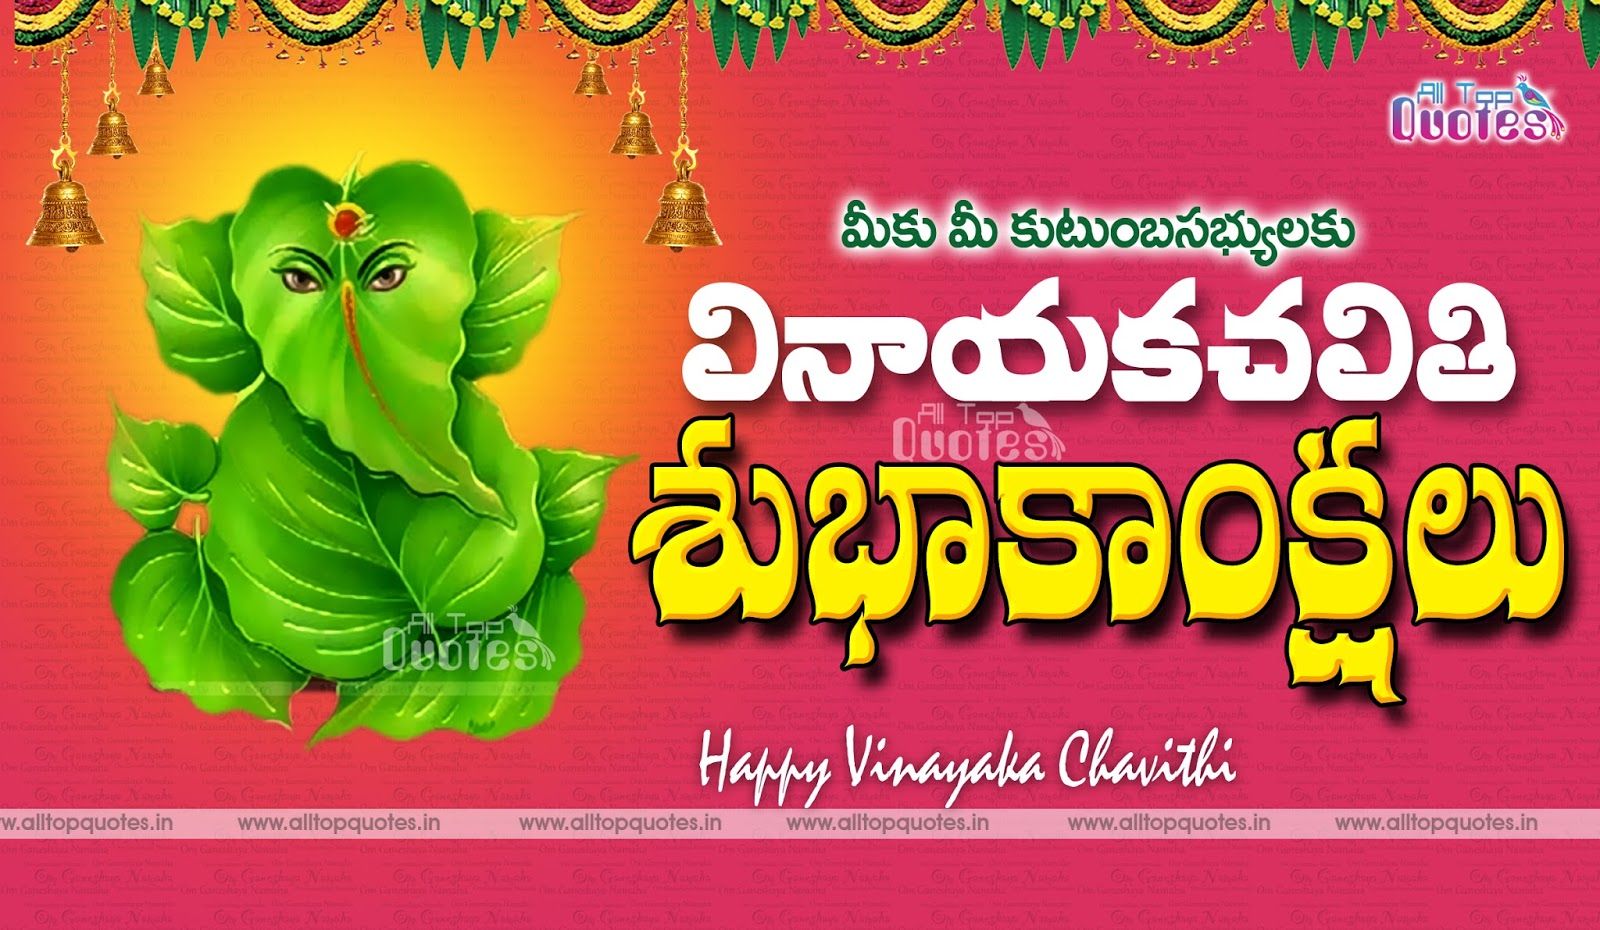 Happy vinayaka chavithi greetings in telugu hd wallpapers all top here is vinayaka chavithi 2015 wallpapers in telugubest vinayaka chavithi information in telugu m4hsunfo Gallery